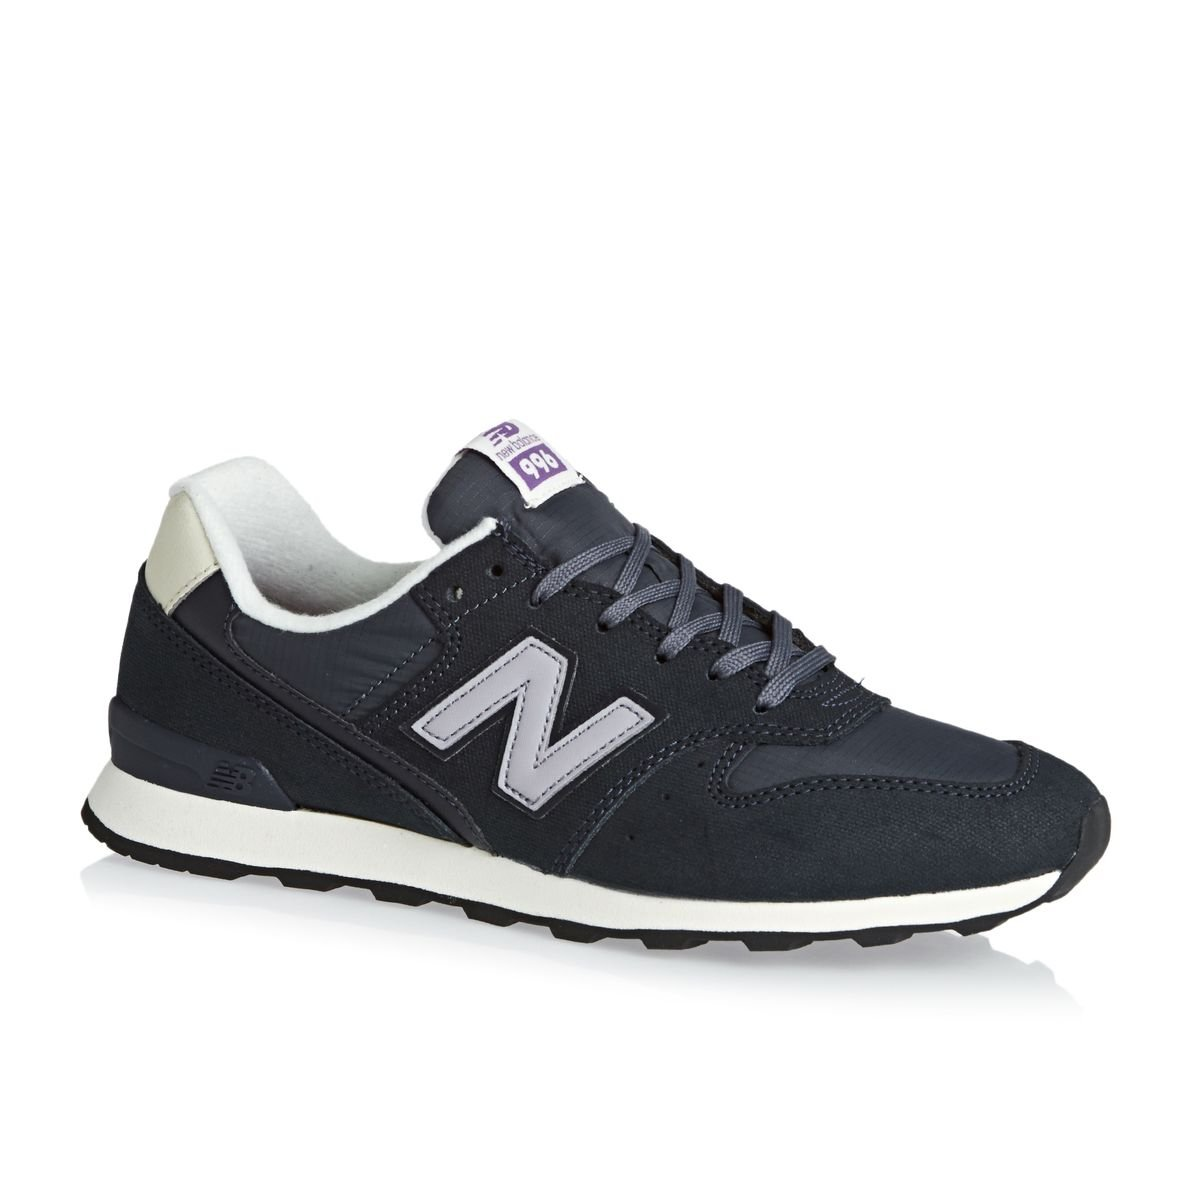 8e69cde9ddf9b Amazon.com: New Balance 996 Womens Sneakers Blue: Clothing